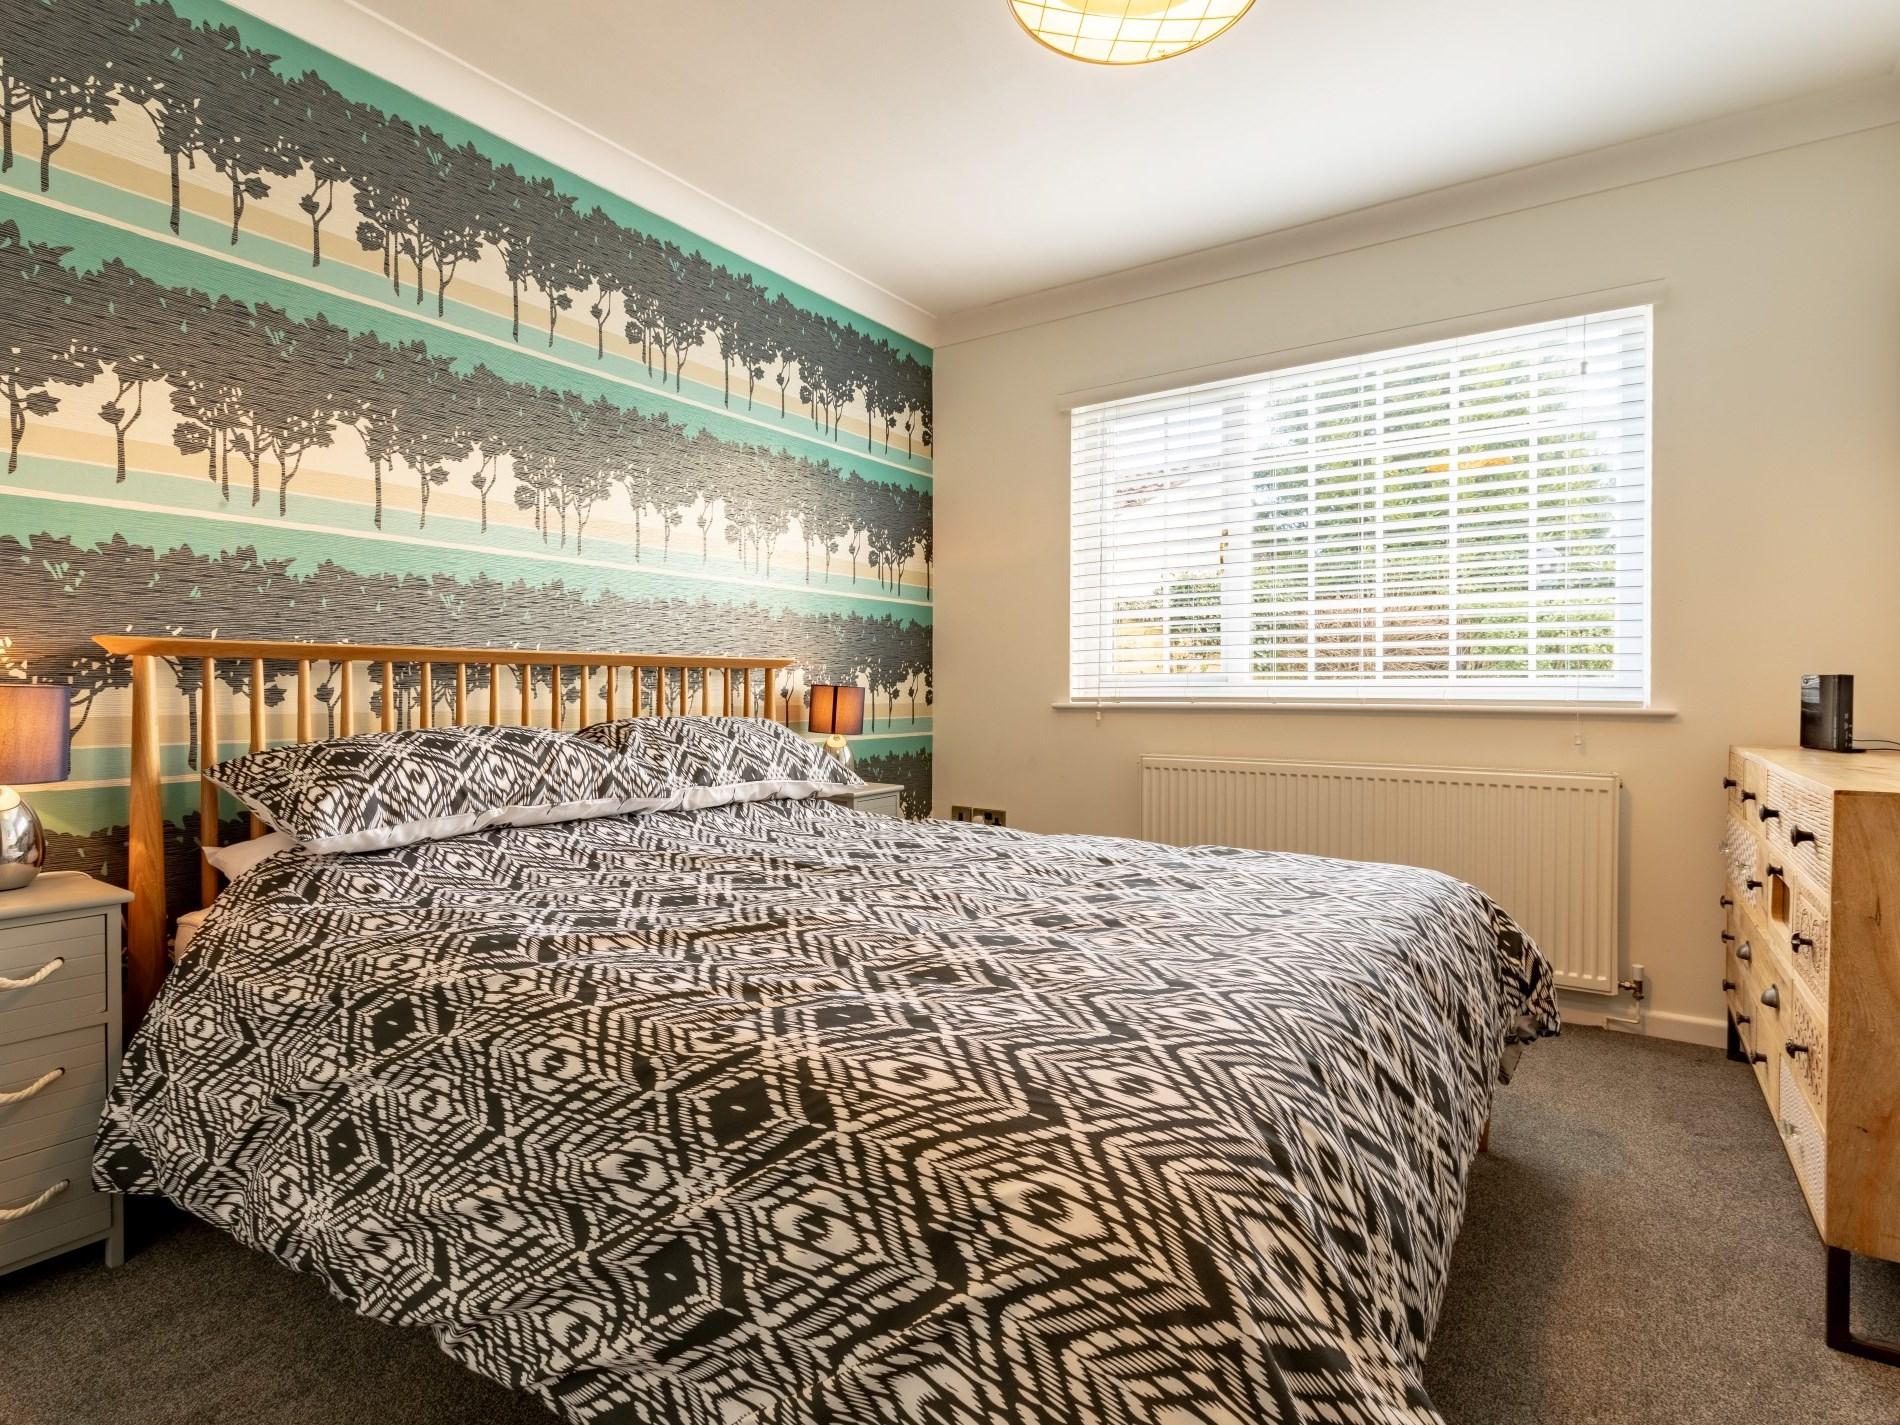 6 Bedroom Cottage in Woolacombe, Devon